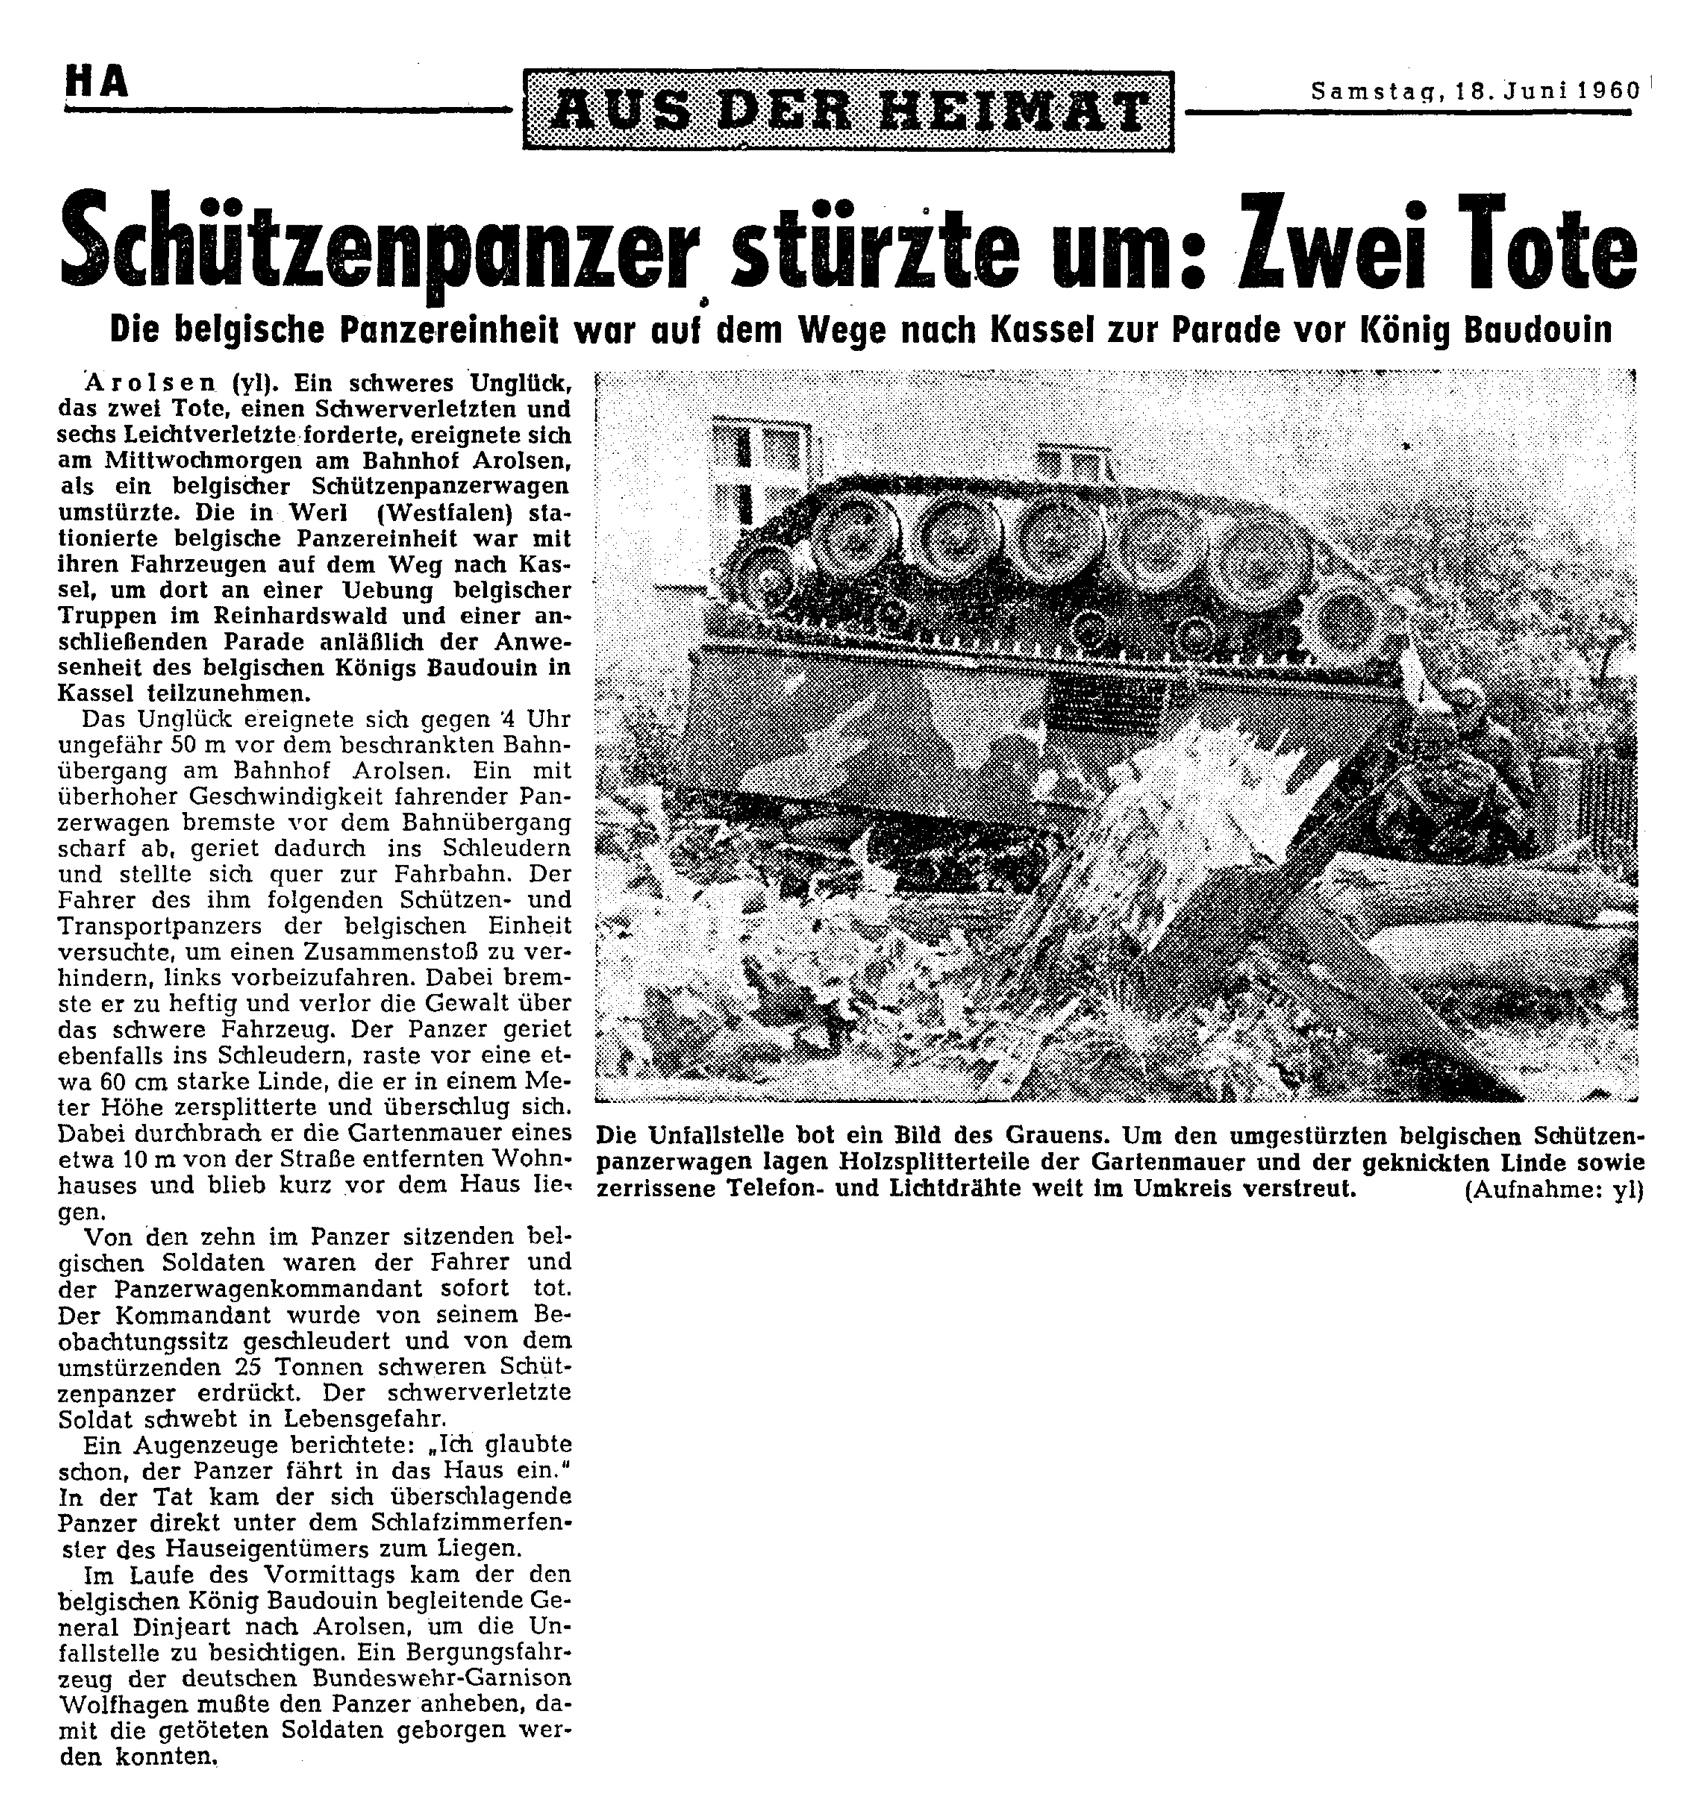 Spz Unfall BE Arolsen 15.6.1960.jpg